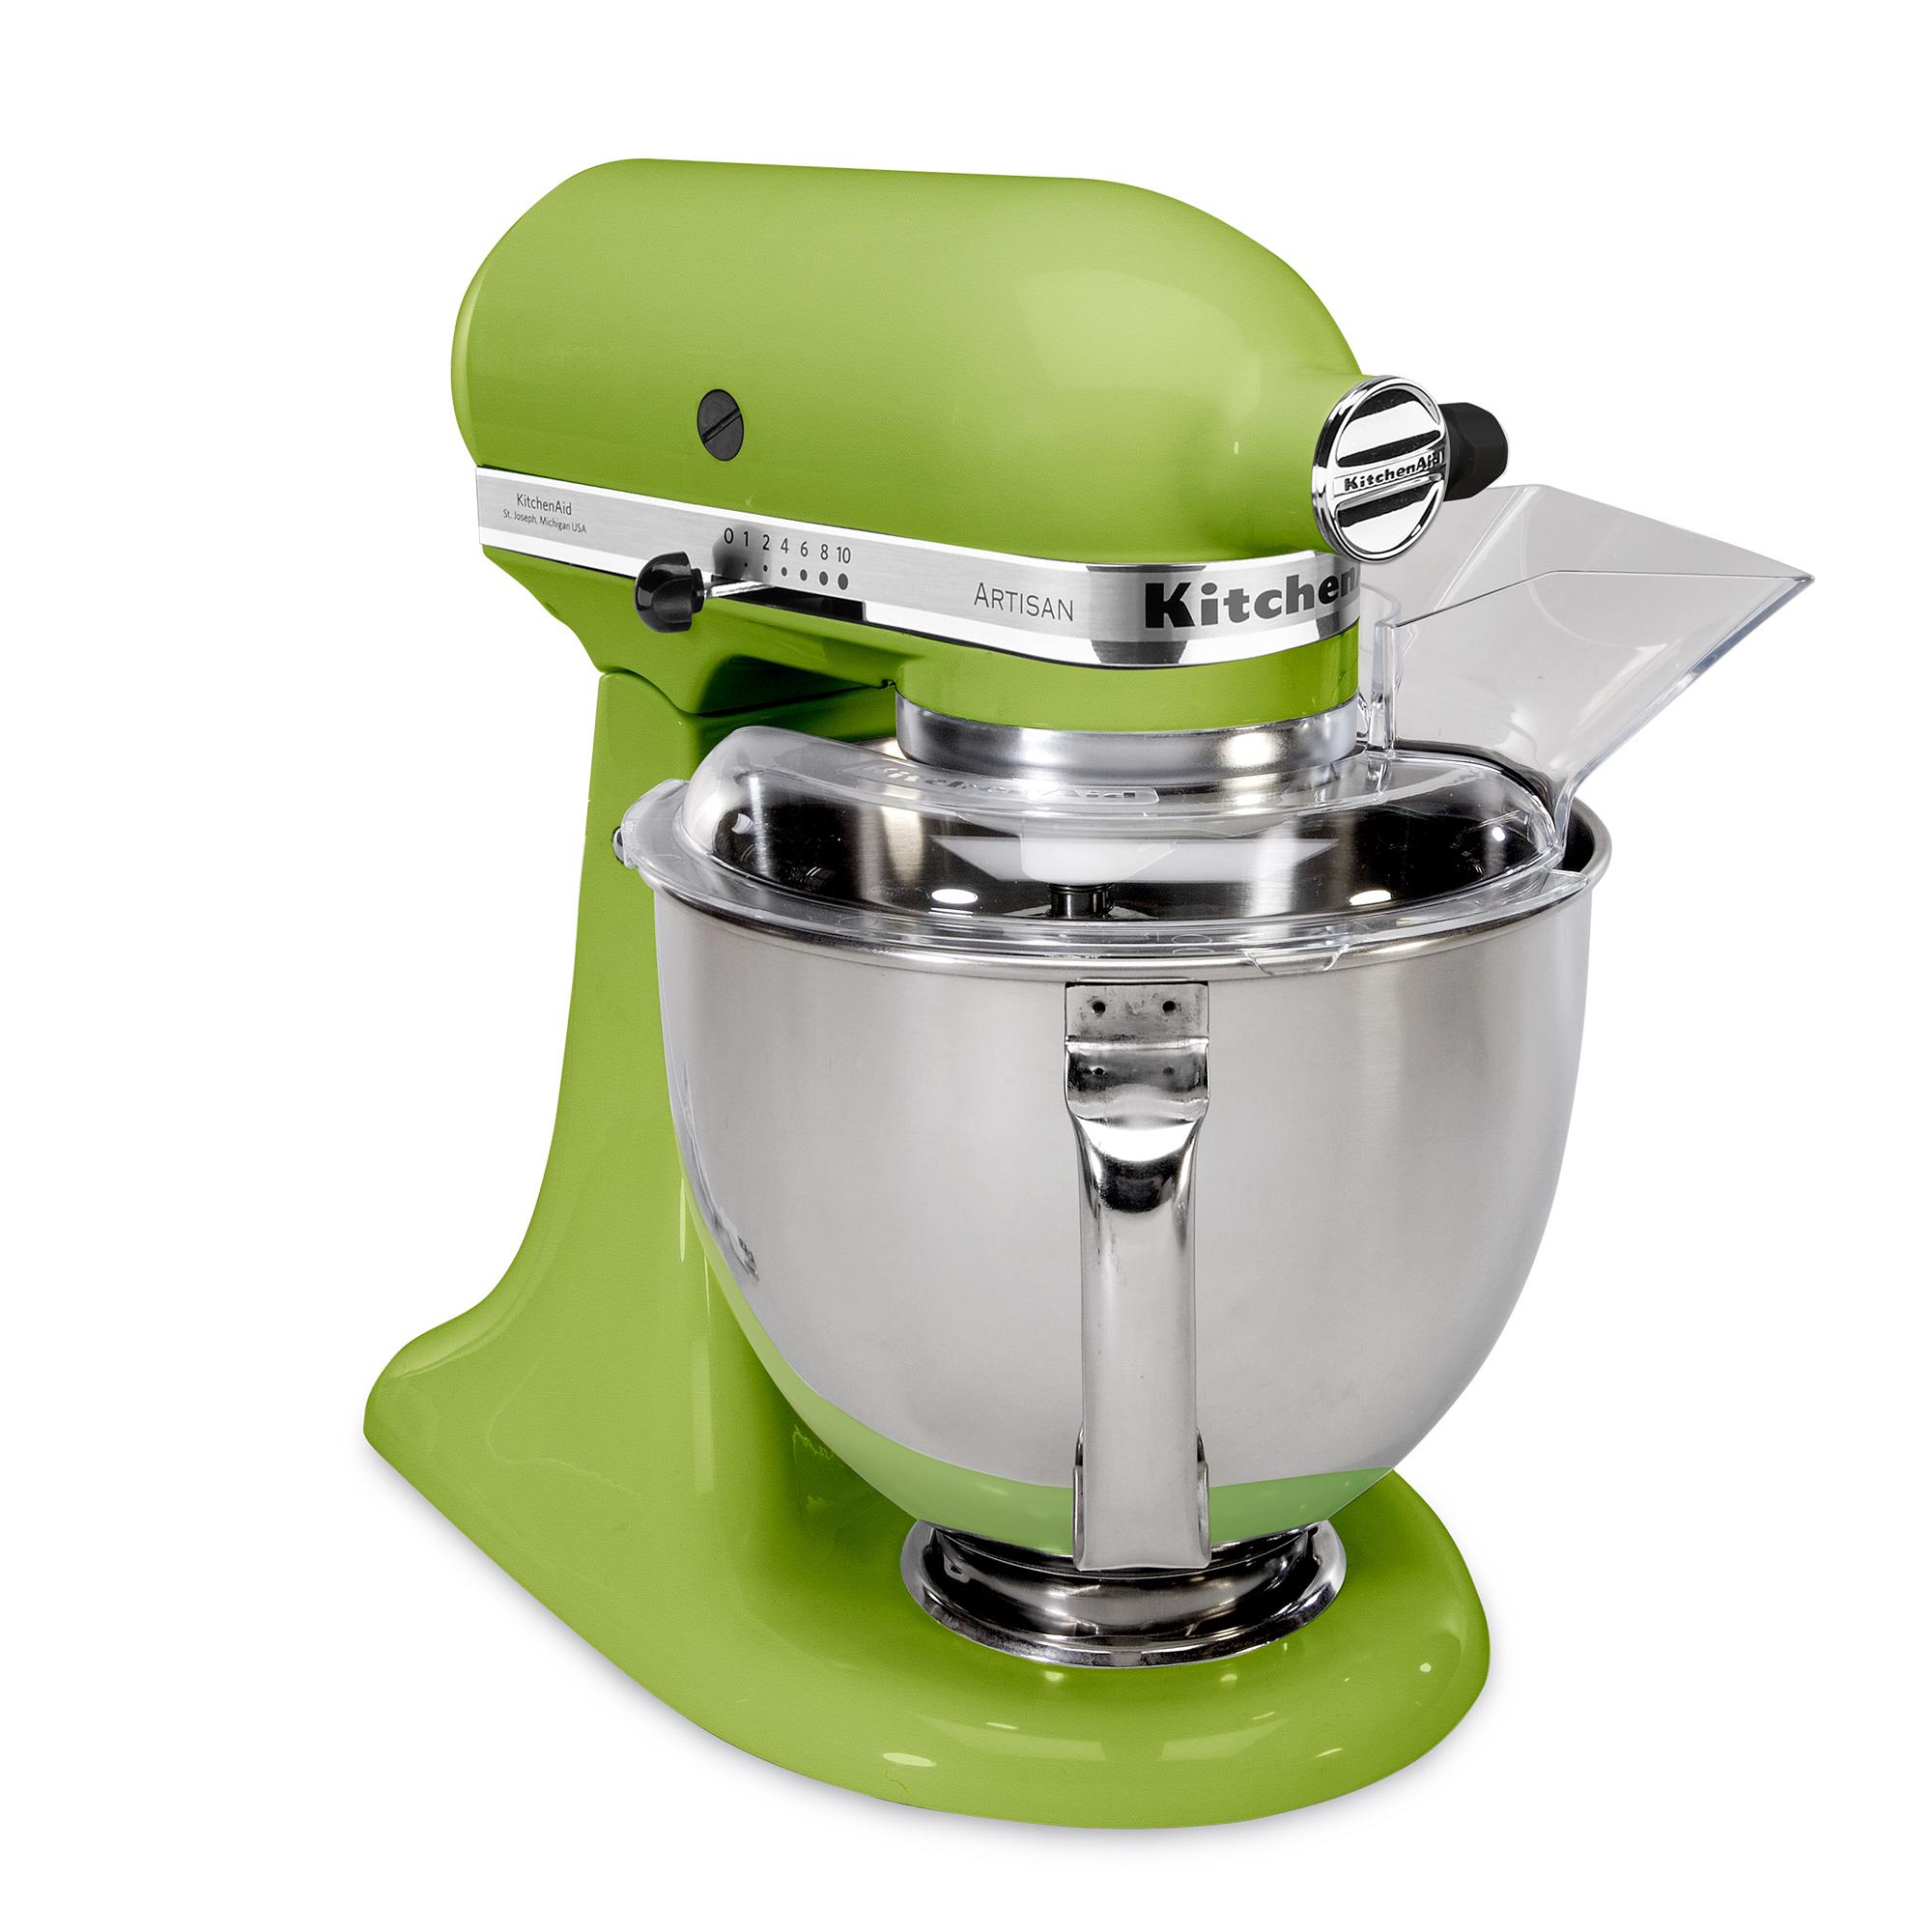 Brand new kitchenaid ksm150ps 5 qt artisan metal stand mixer 325w w pour shield ebay - Kitchenaid artisan qt stand mixer sale ...